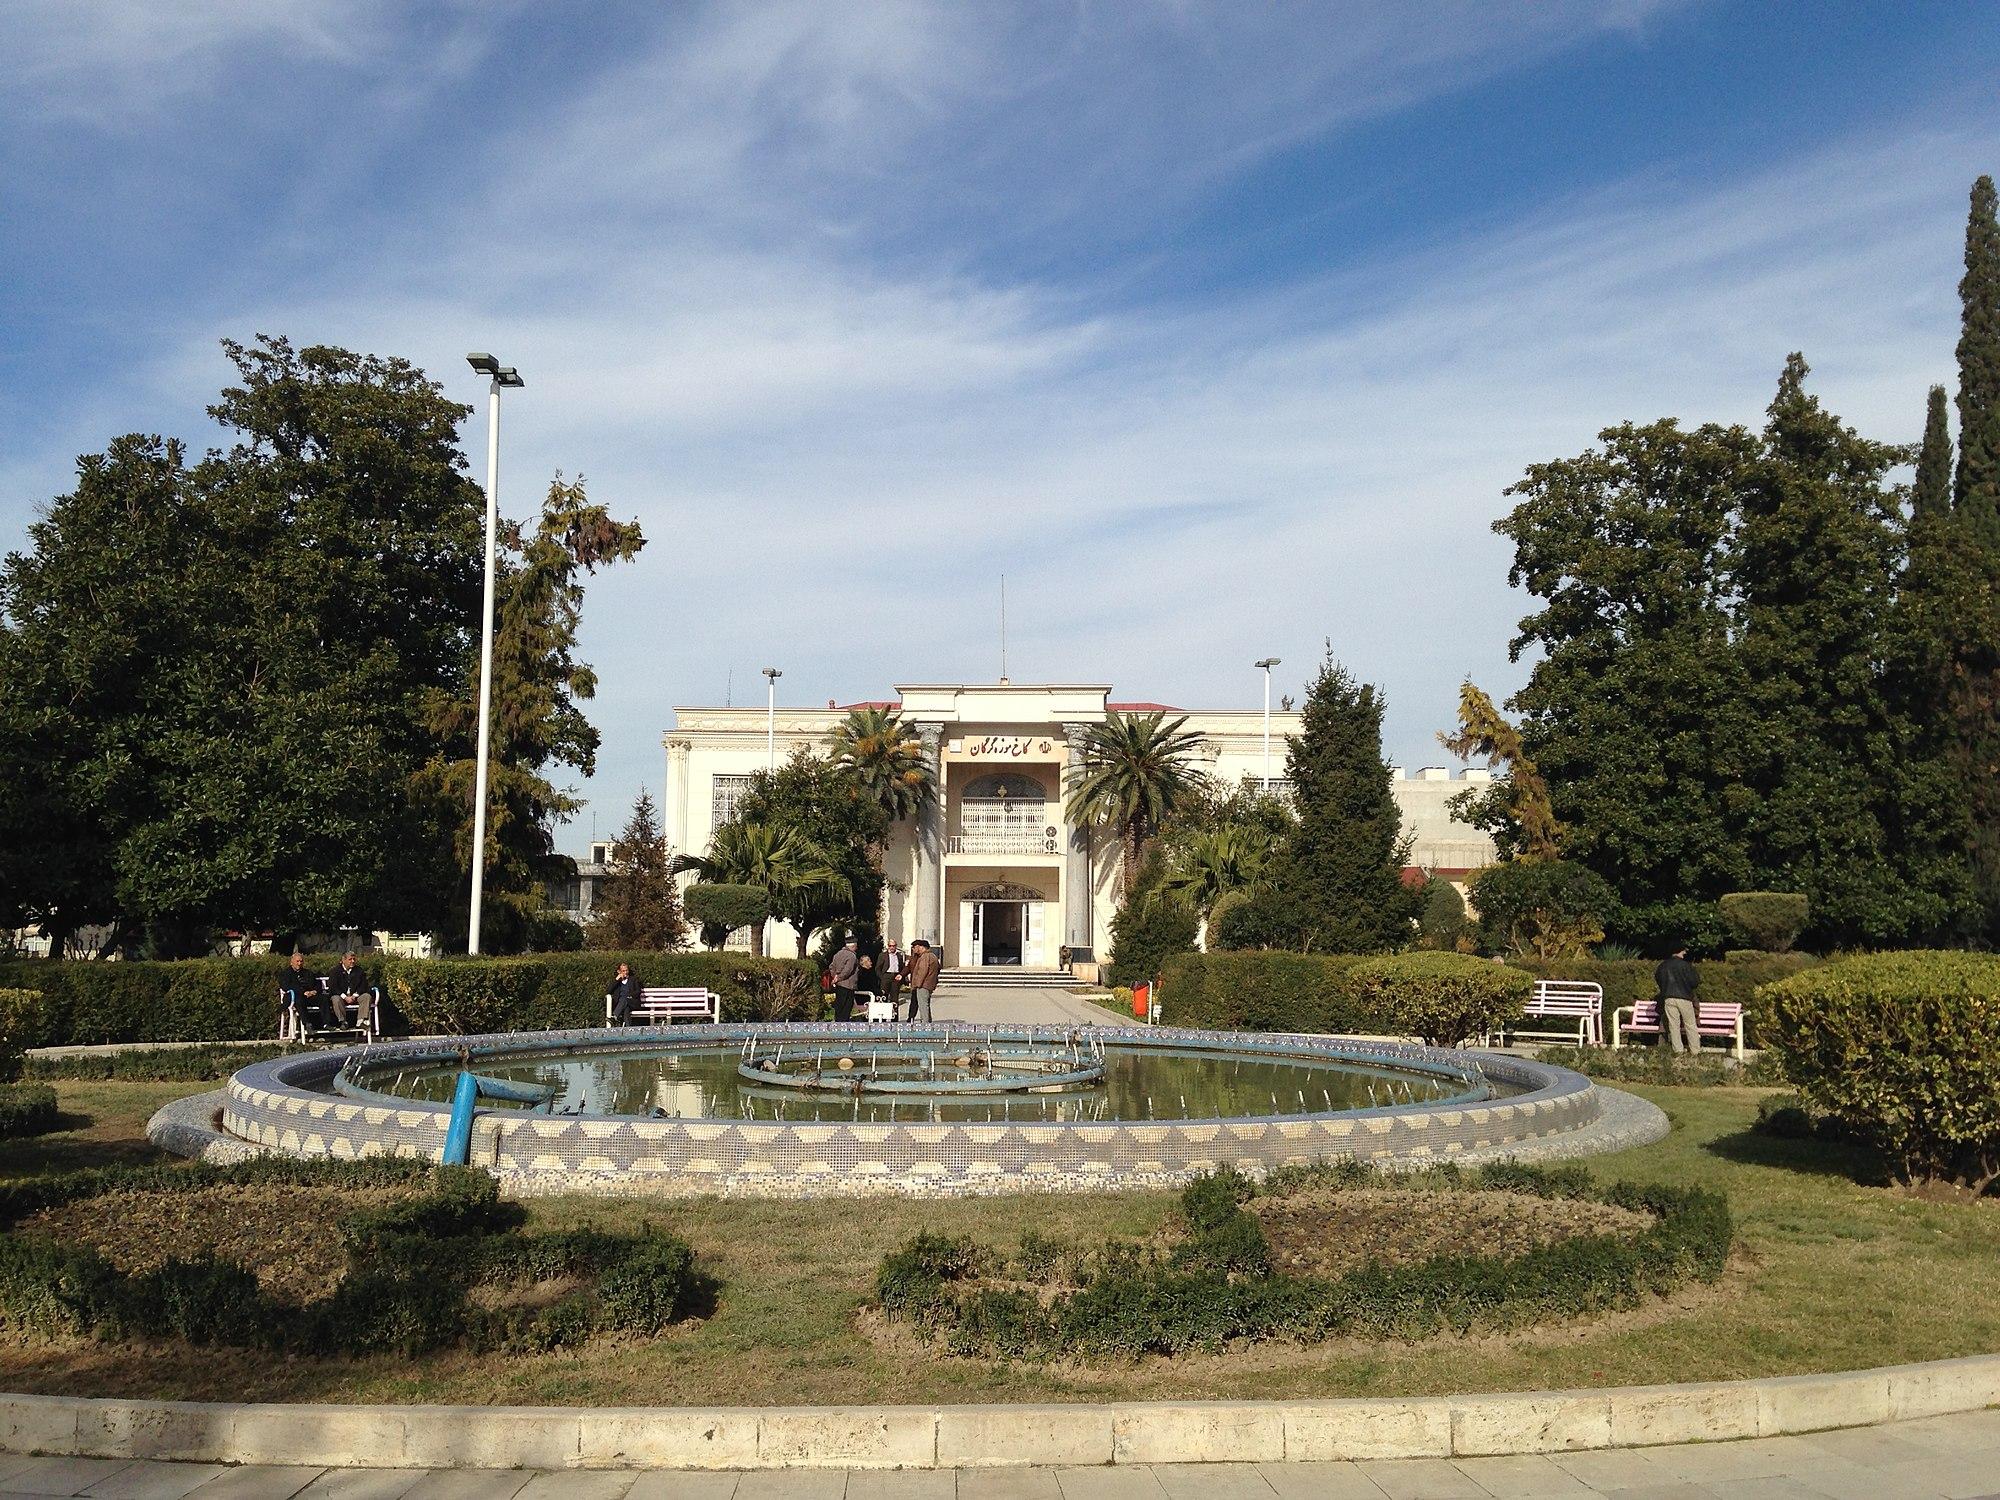 کاخ اختصاصی گرگان